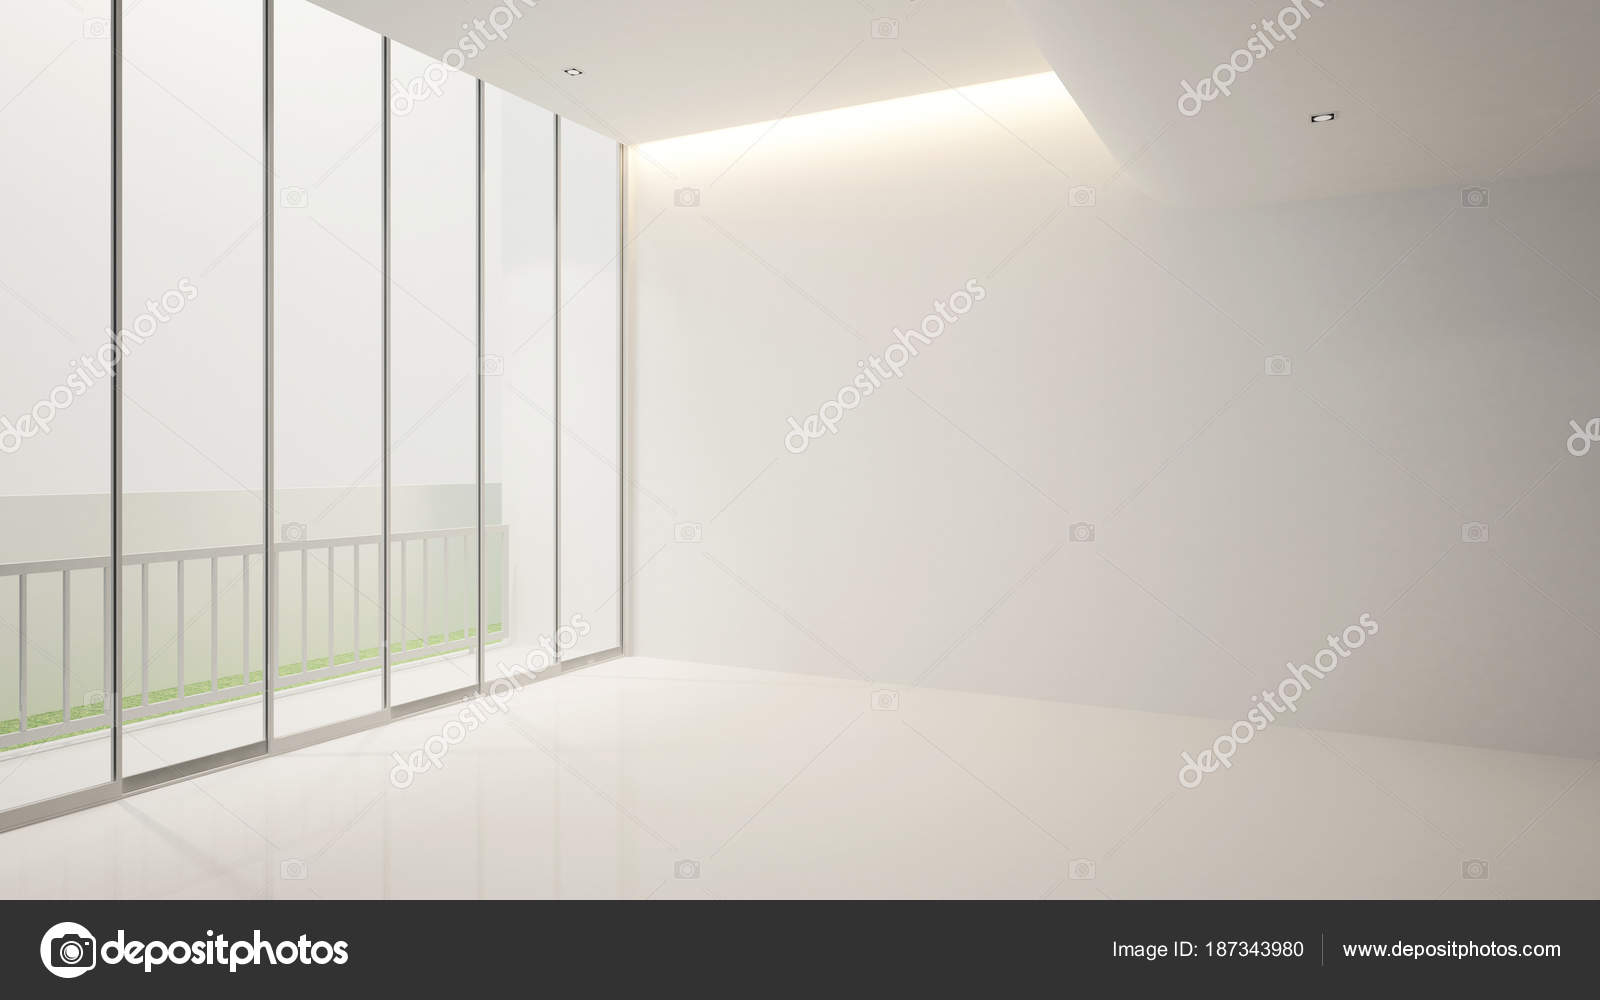 Simpel Balkon Ontwerp : Witte lege kamer en balkon voor artwork interieur design 3d